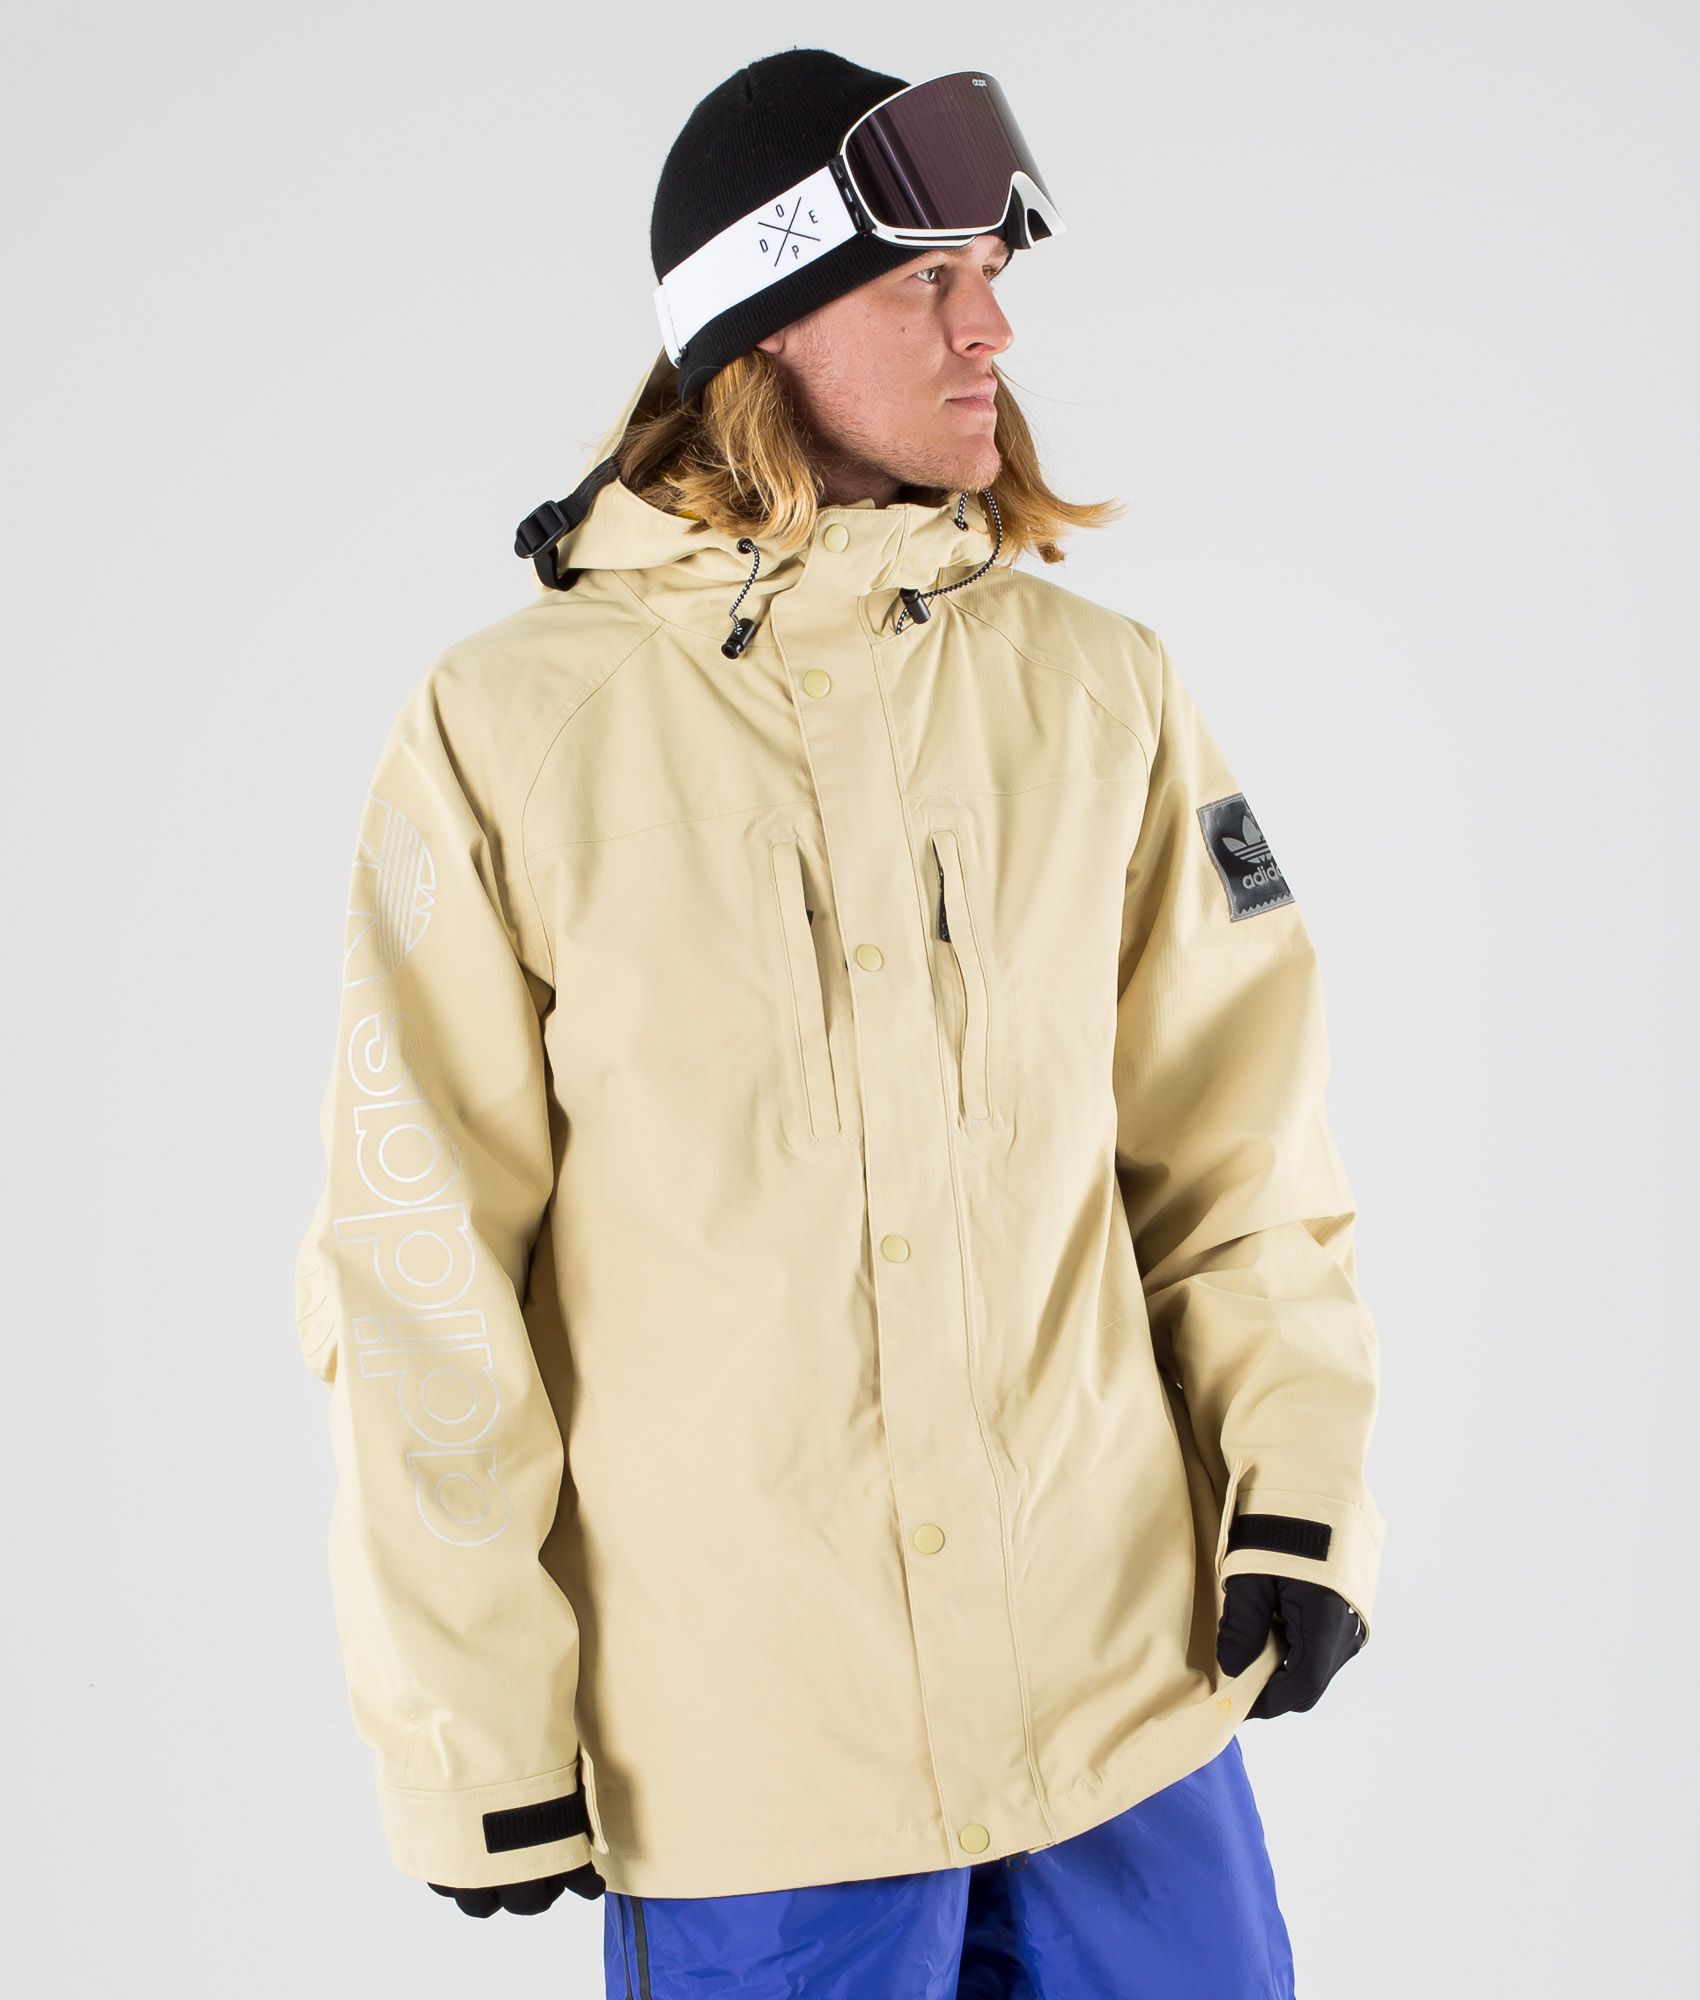 GIACCA SNOWBOARD UOMO ADIDAS UTILITY JACKET SAND COLLEGIATE GOLD